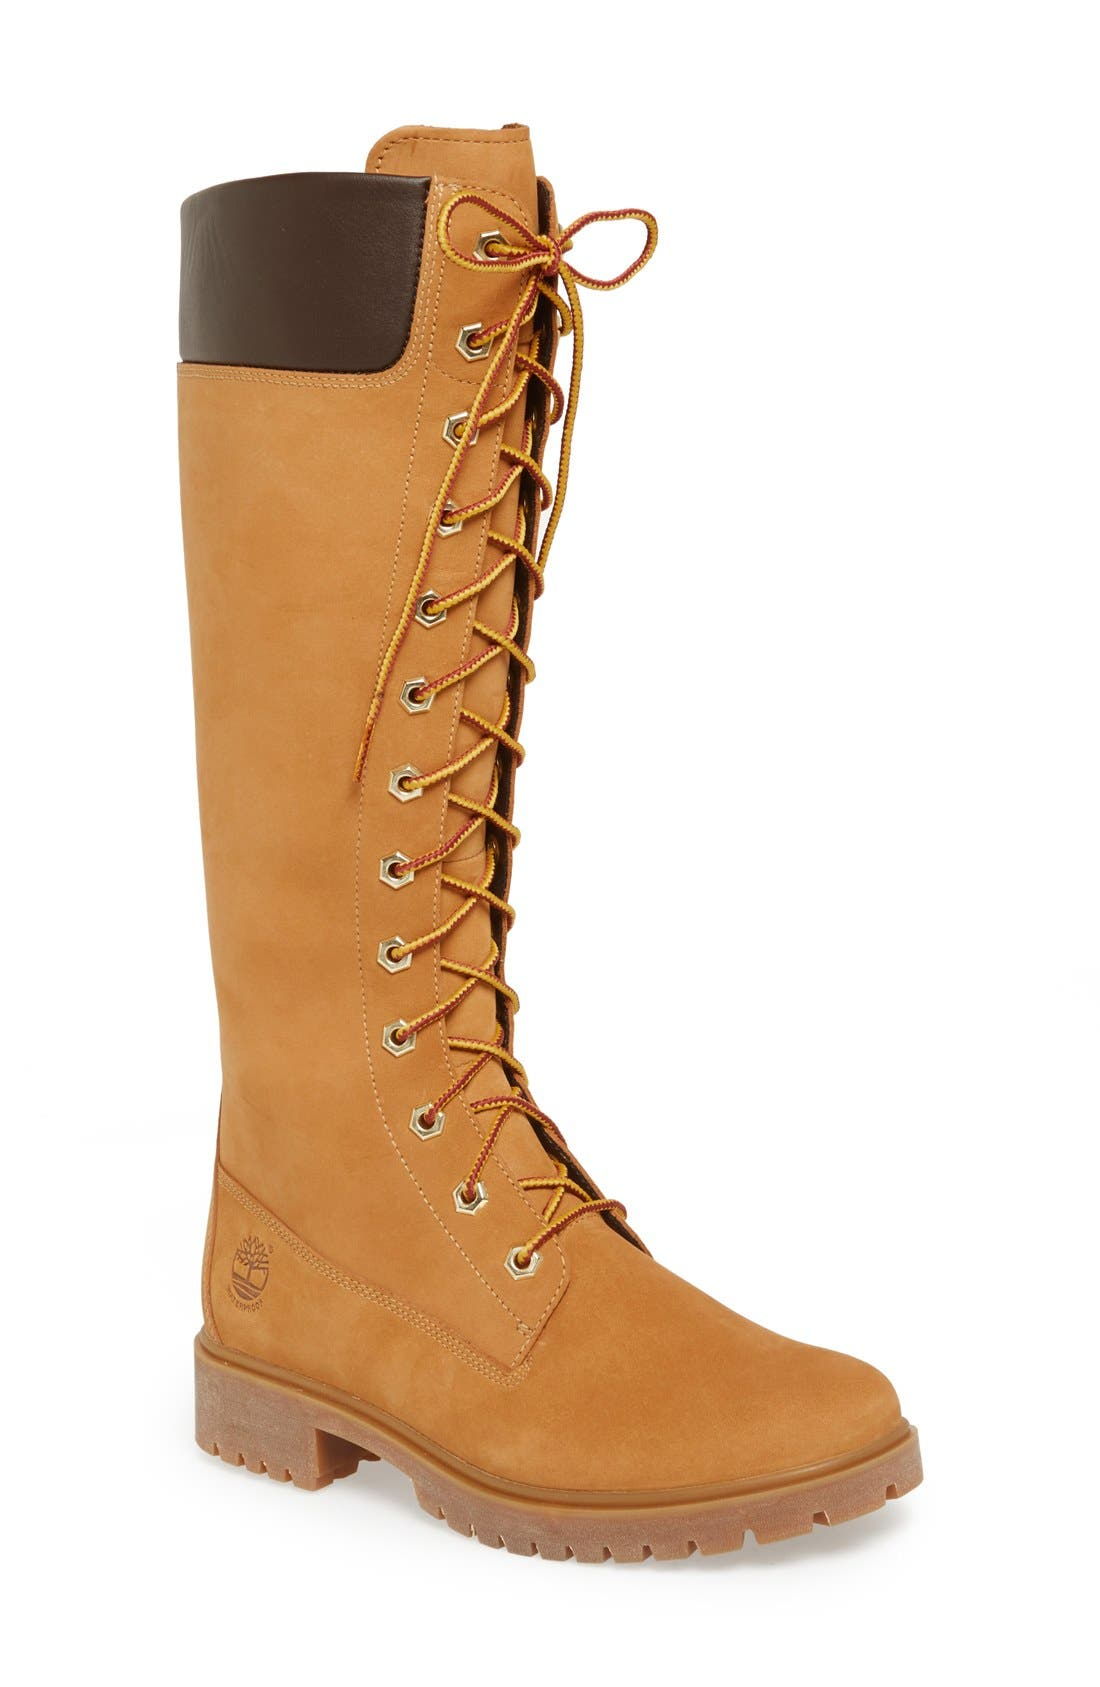 Alternate Image 1 Selected - Timberland Earthkeepers® Waterproof Tall Boot (Women)